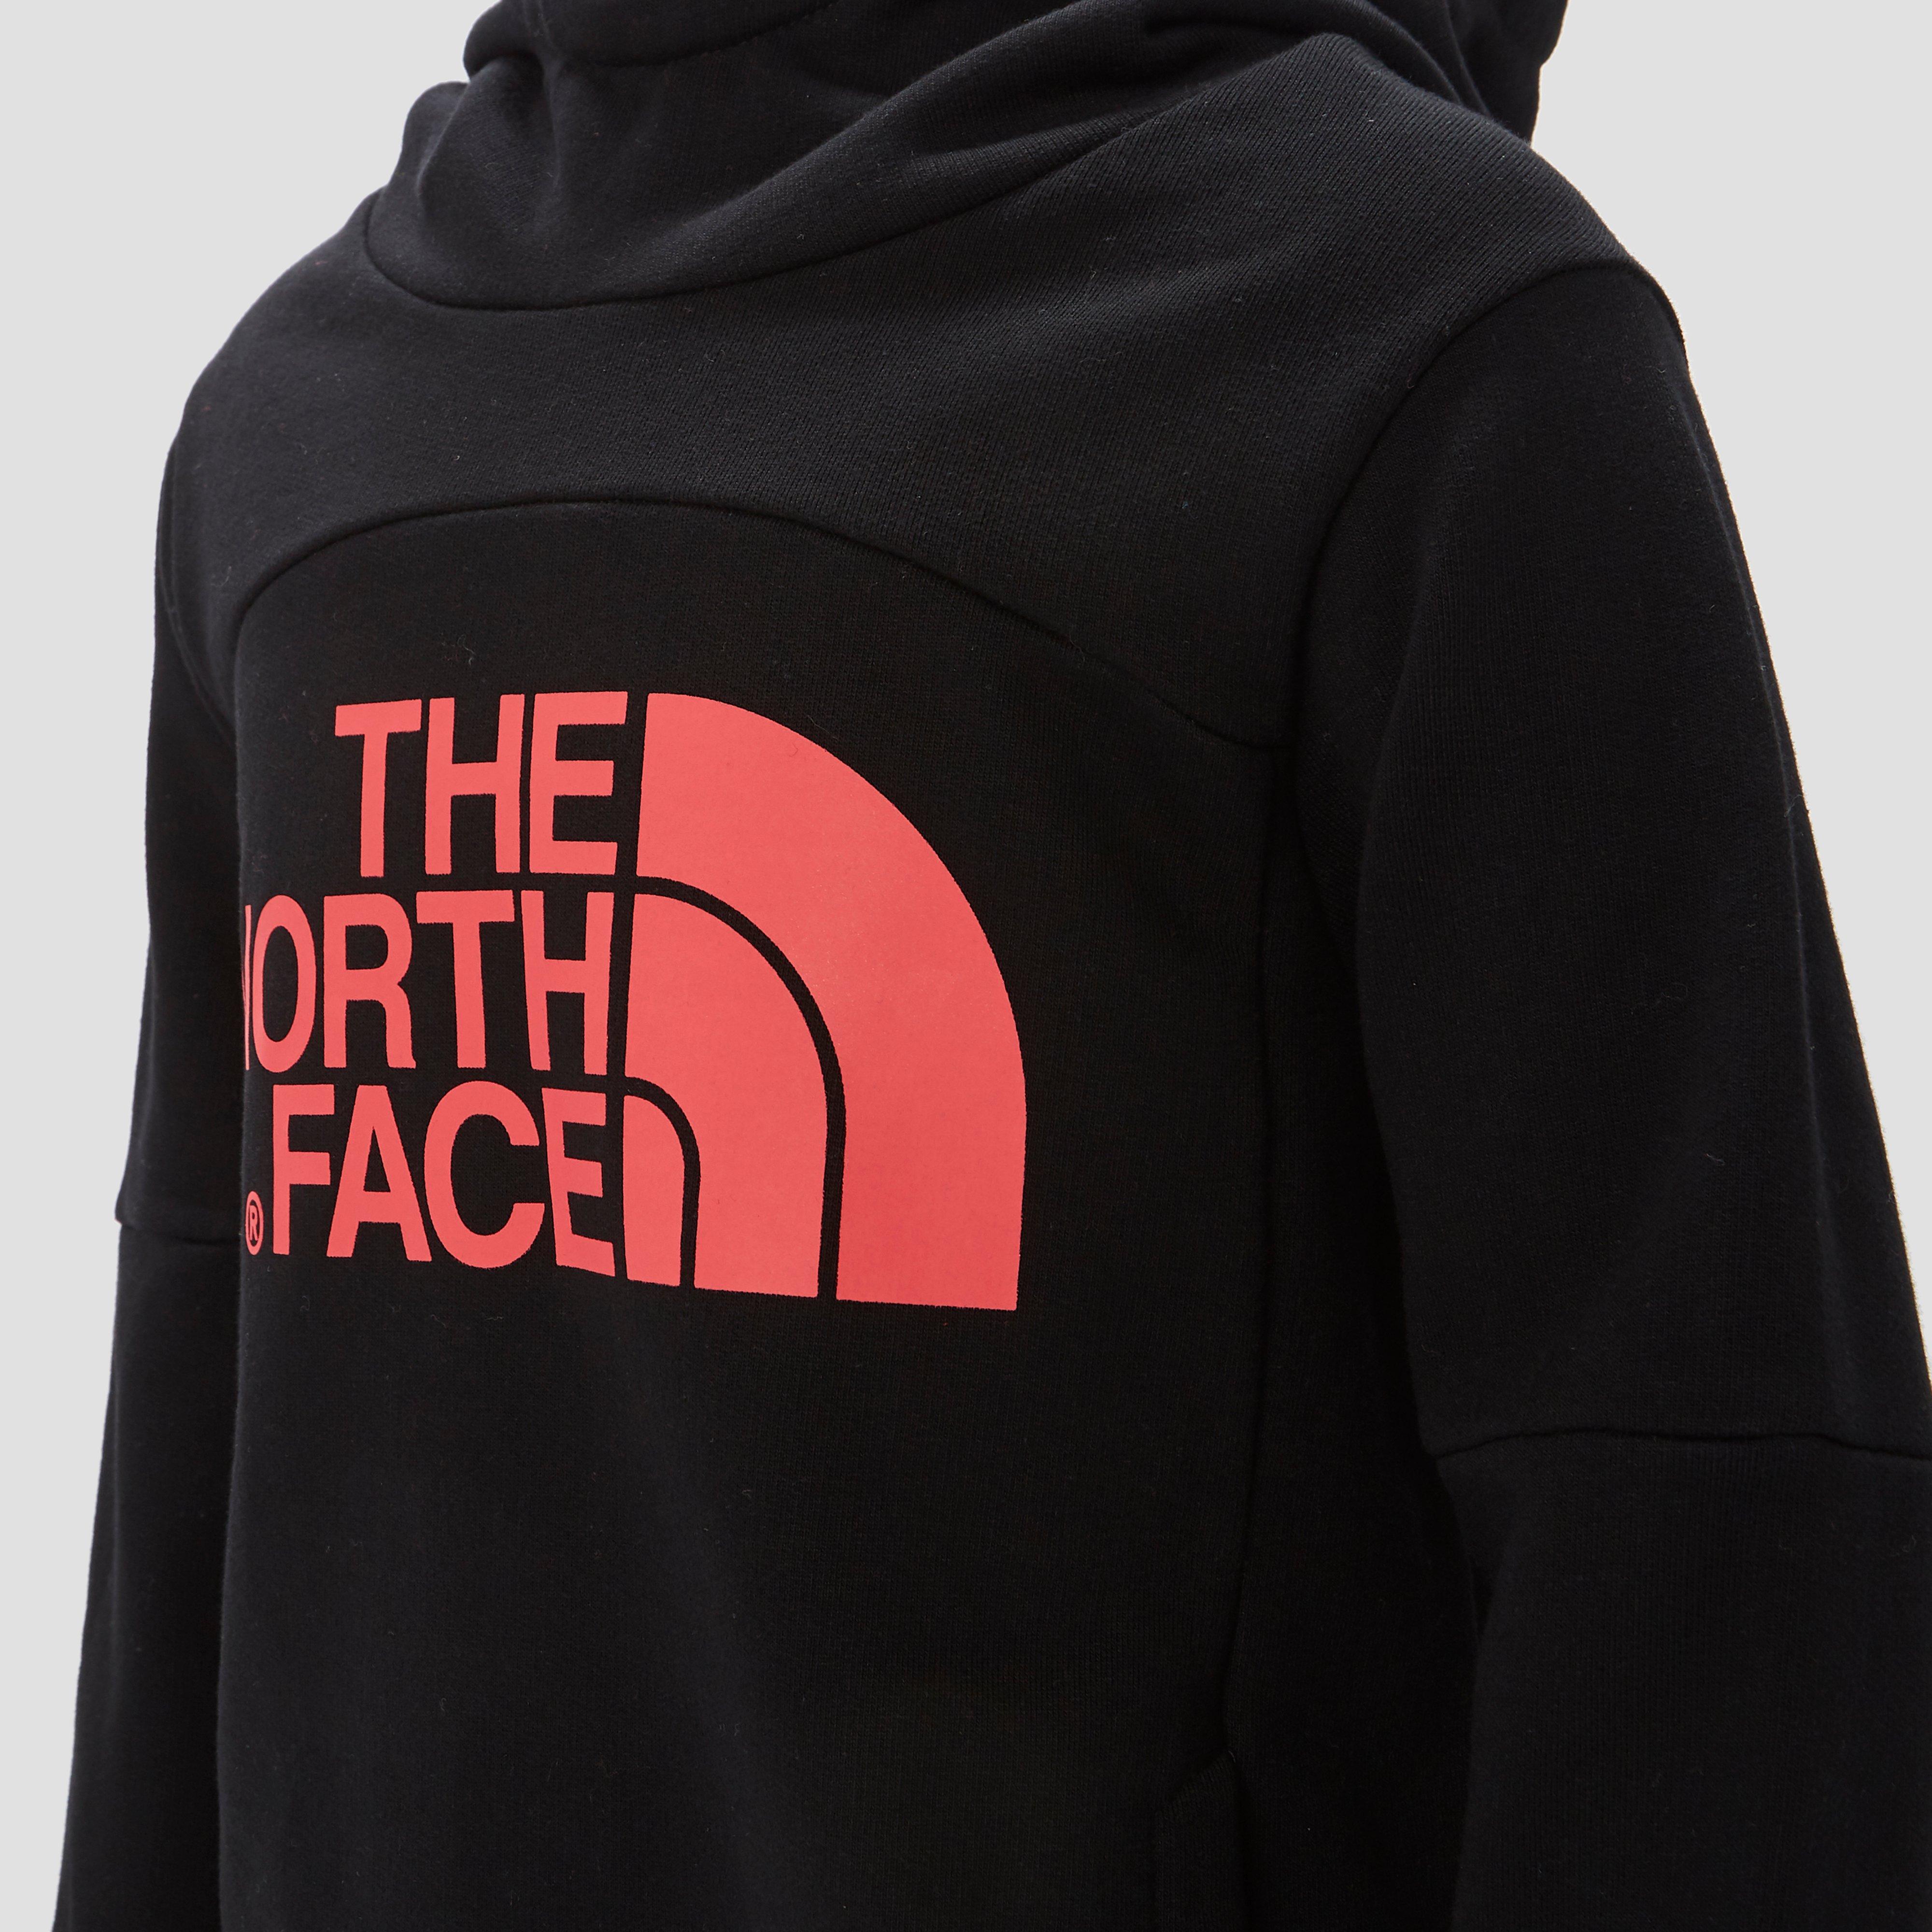 THE NORTH FACE DREW PEAK TRUI ZWART KINDEREN